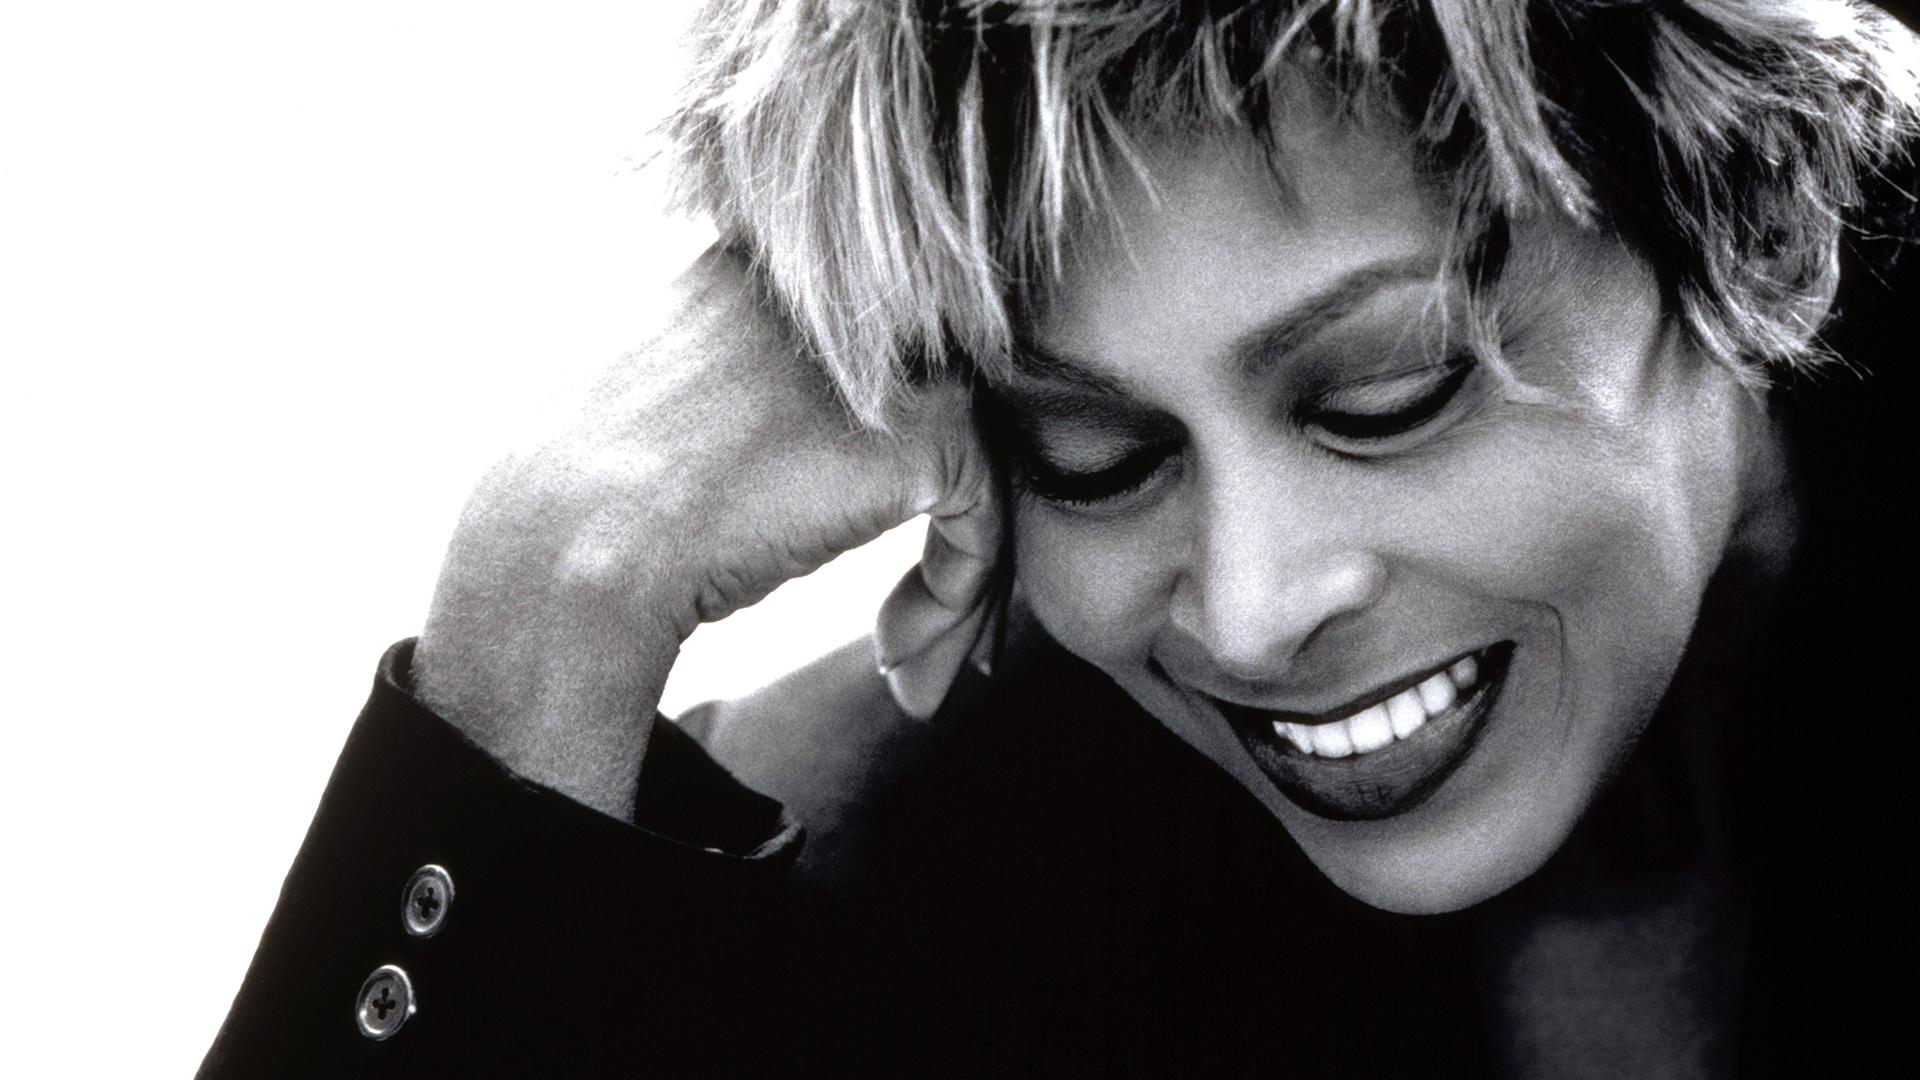 Tina Turner backdrop wallpaper